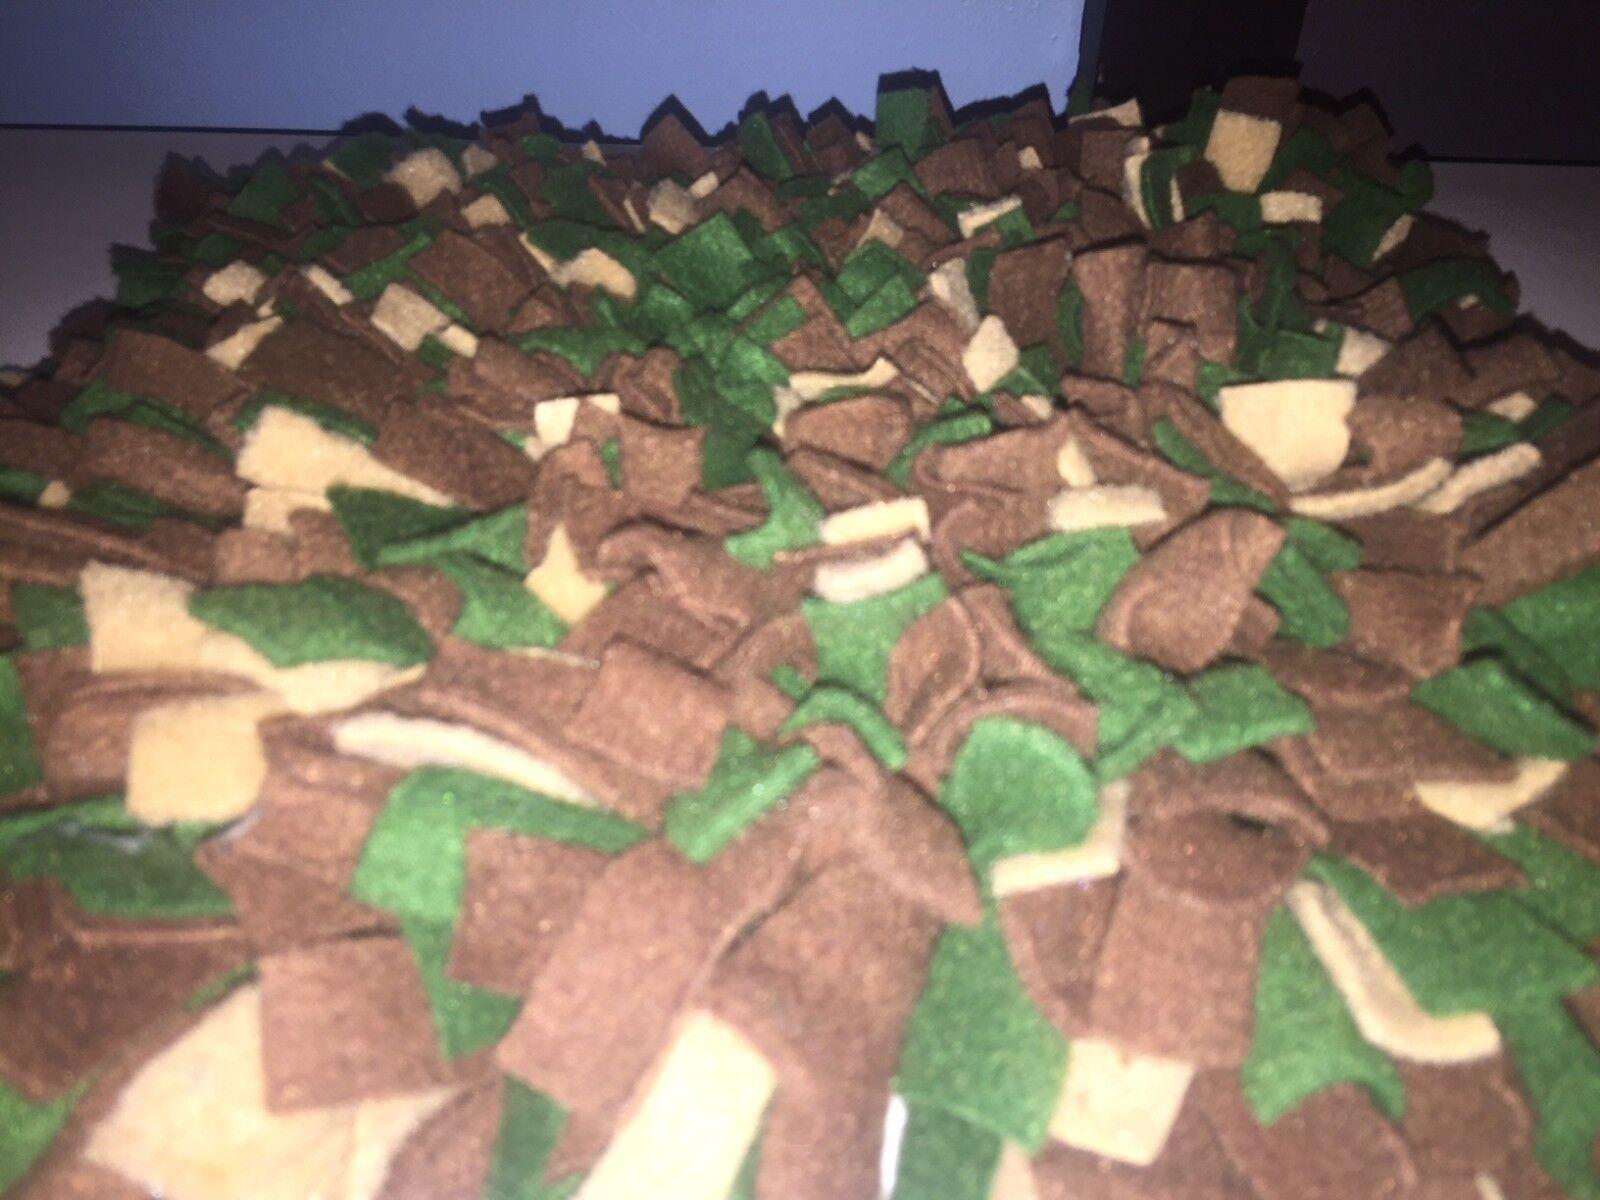 Handmade BrownTanHunter Green DogPig Snuffle MatTraining Feeding Mats 48x24